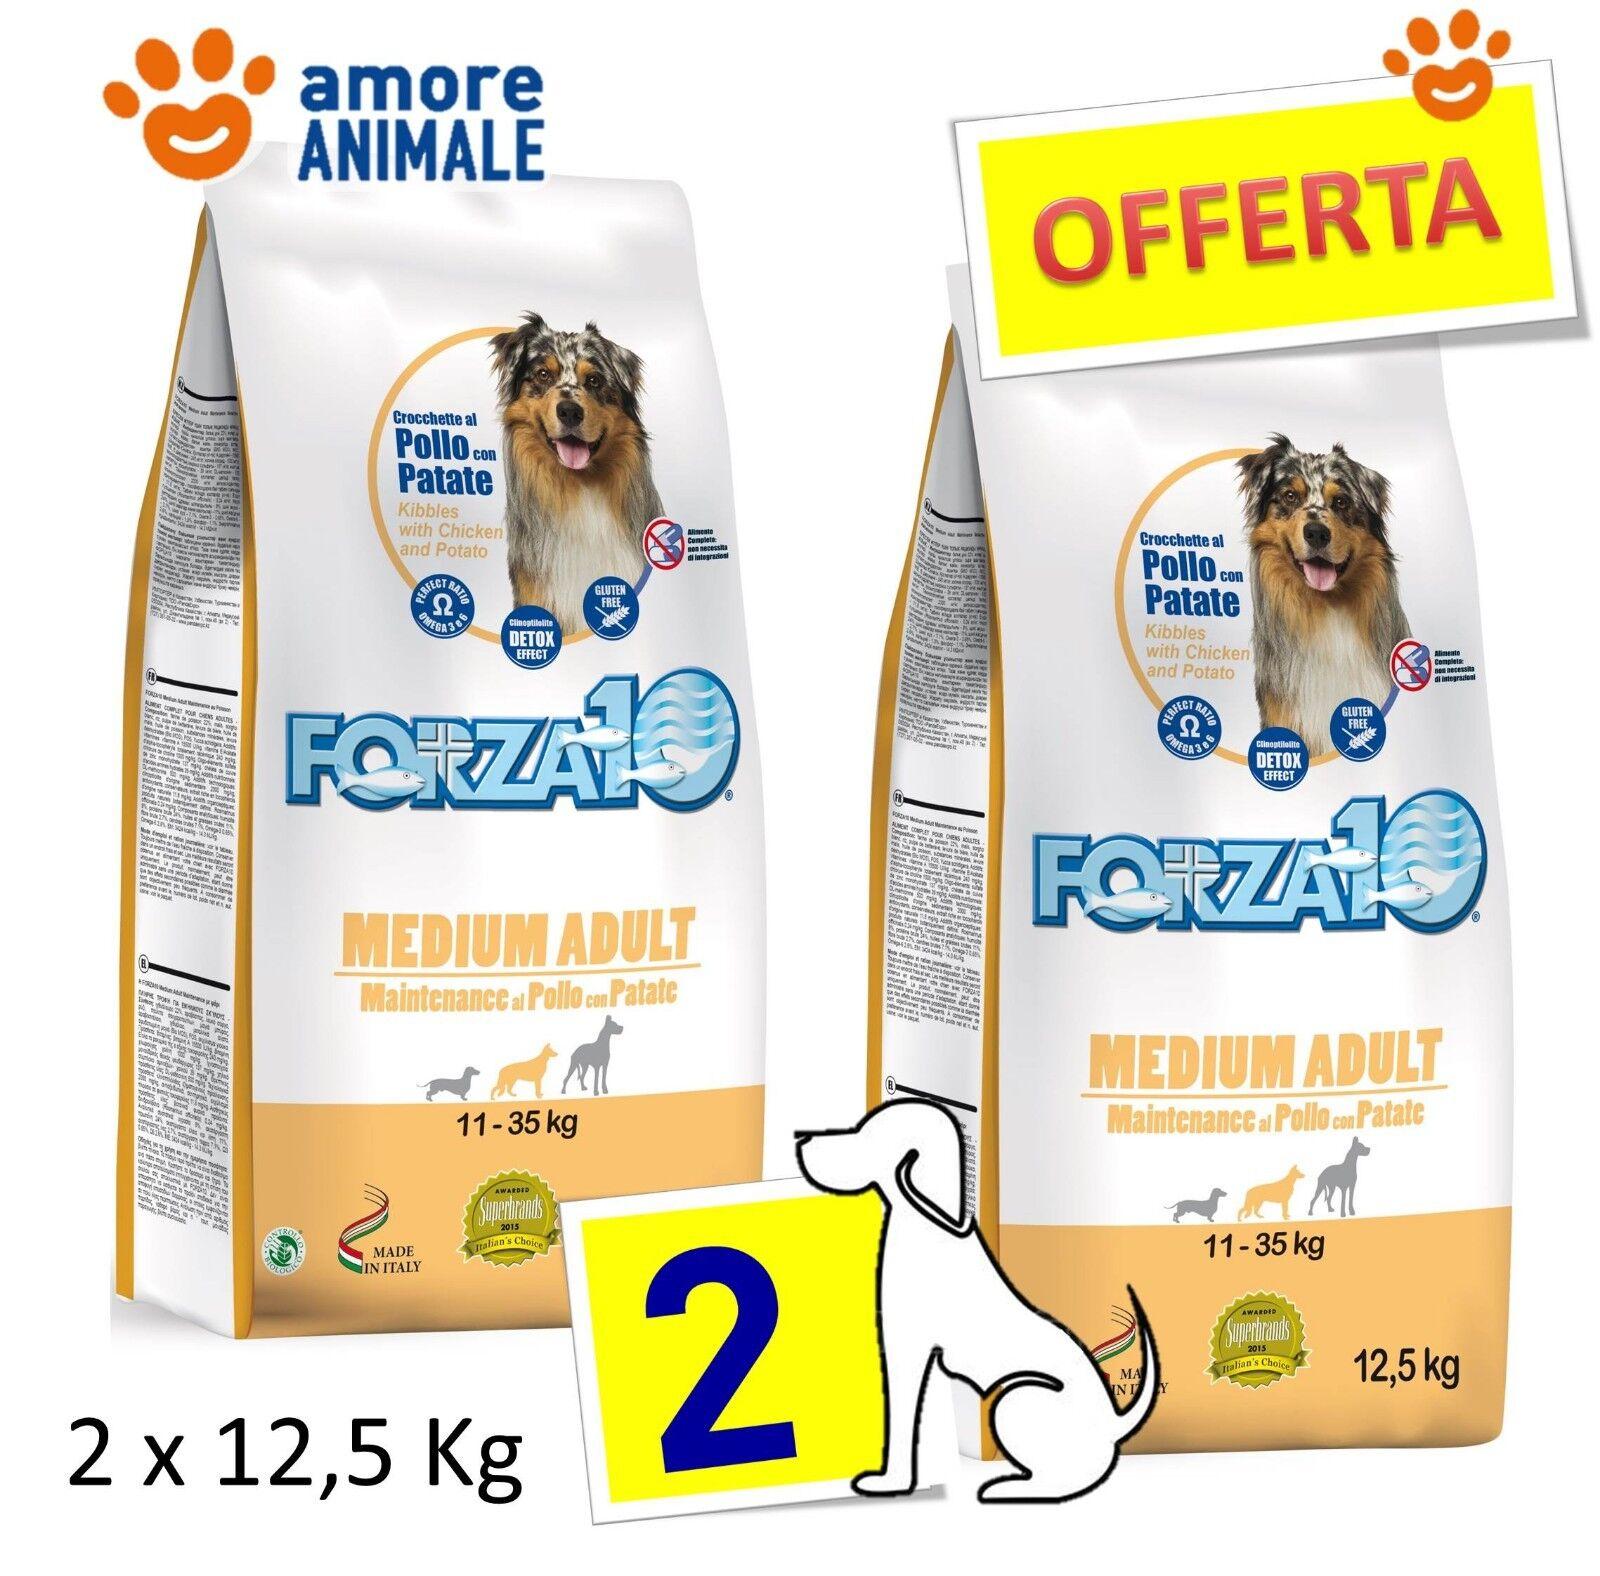 2 SAC   Forza10 Dog Maintenance Medium Adult al Pollo 12,5 kg  Per cani